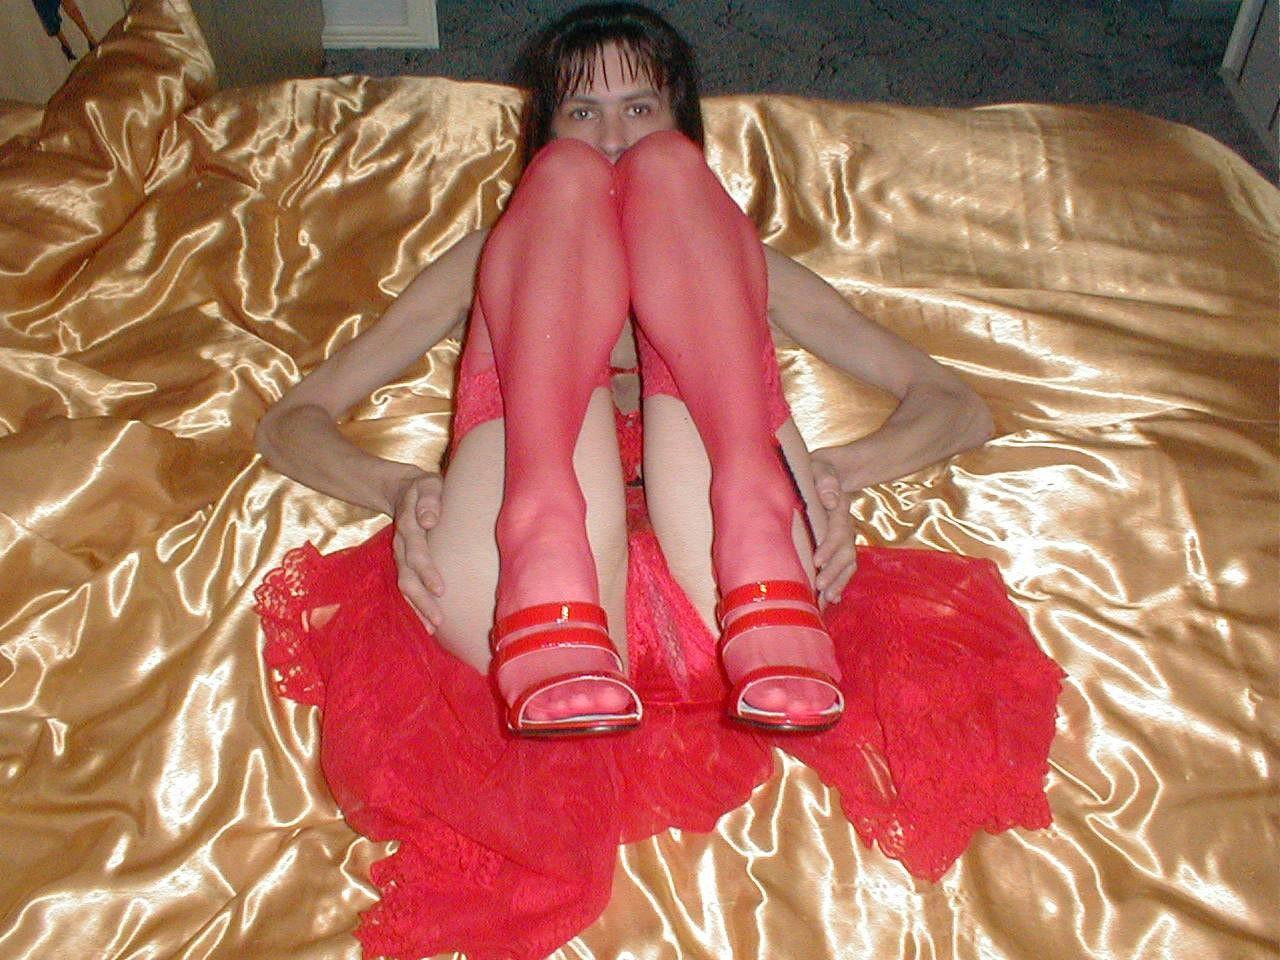 http://pbs-2.adult-empire.com/85/8570/019/pic/10.jpg